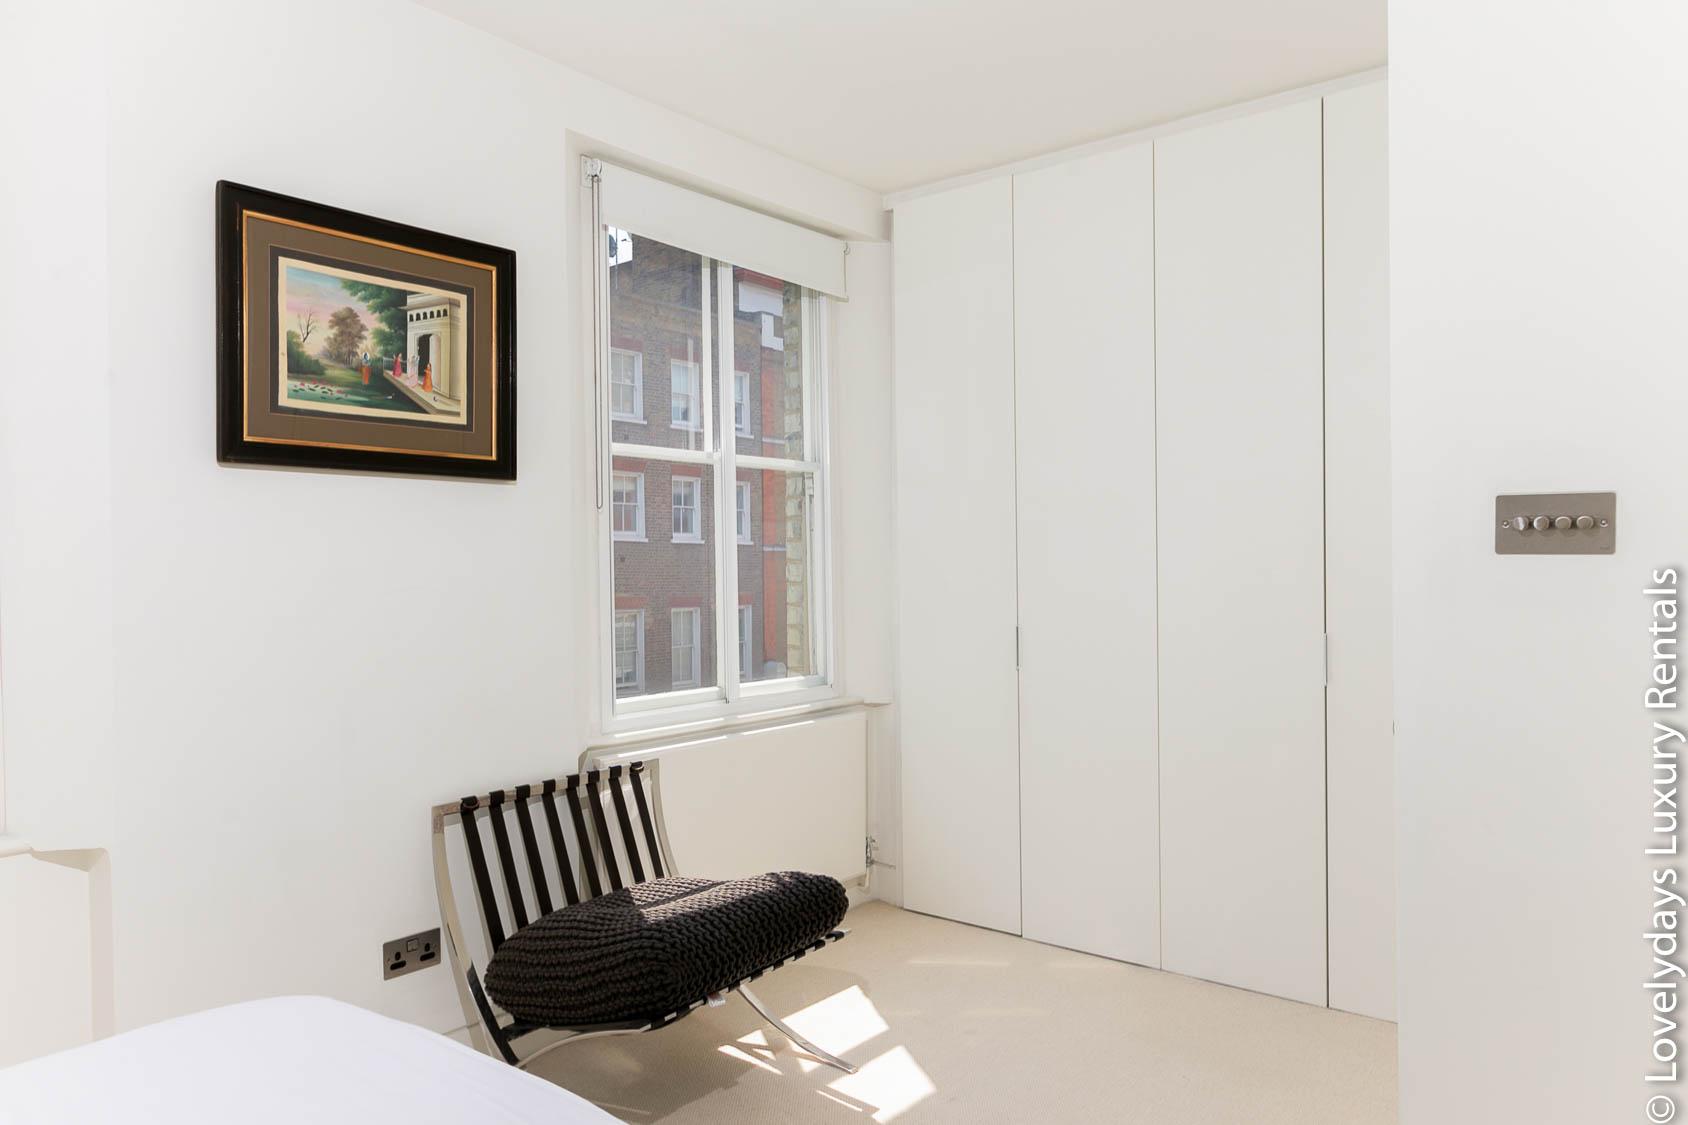 Lovelydays luxury service apartment rental - London - Fitzrovia - Foley Street - Lovelysuite - 2 bedrooms - 2 bathrooms - Double bed - 61f13e9d50b5 - Lovelydays